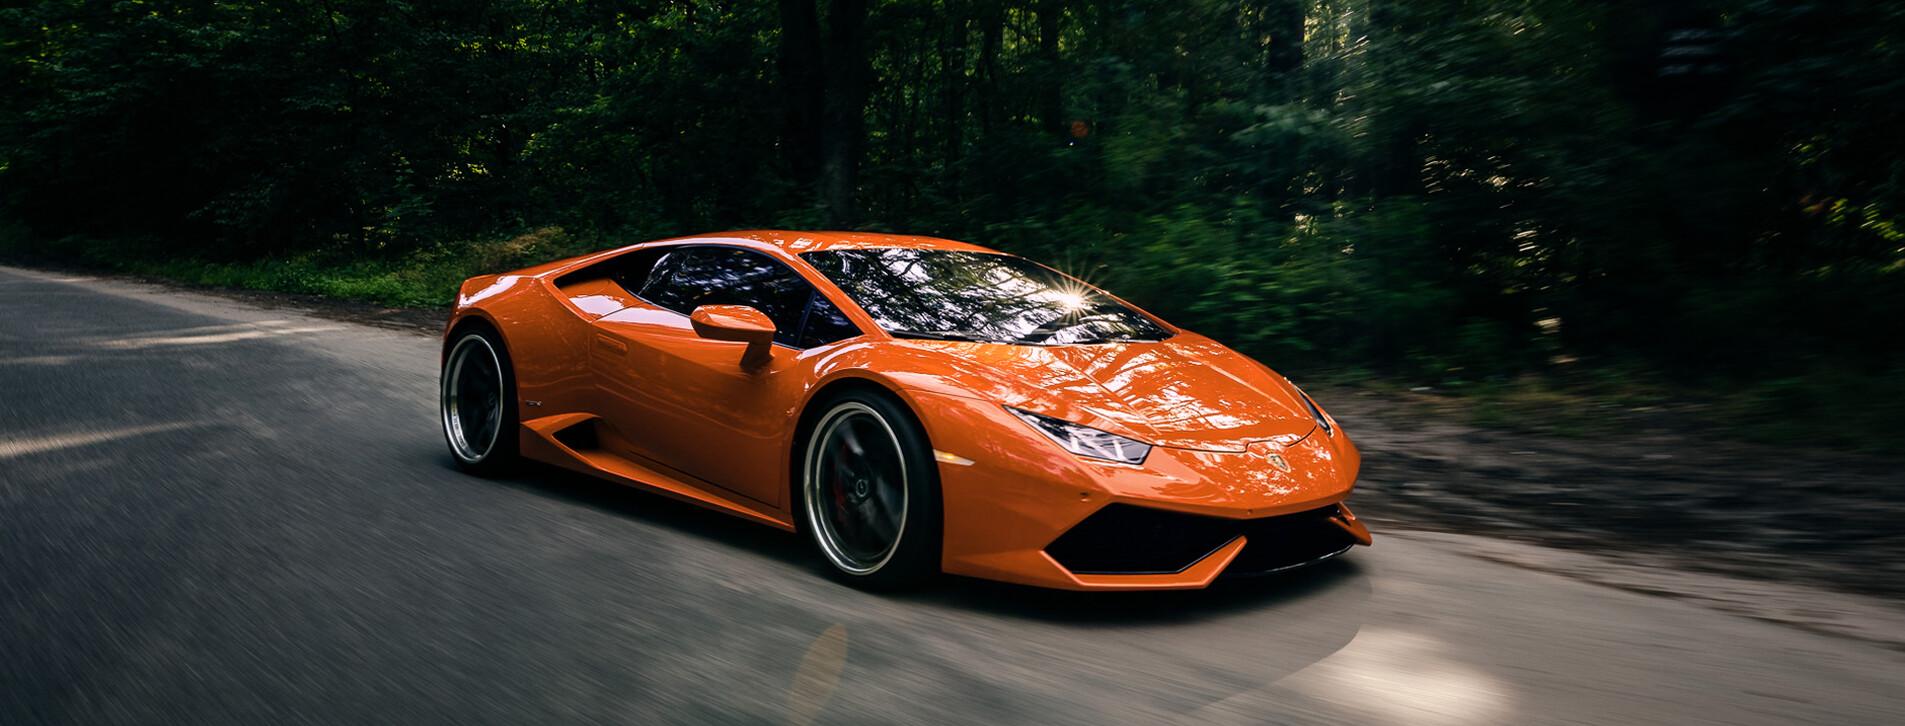 Фото - Тест-драйв суперкара Lamborghini для двоих